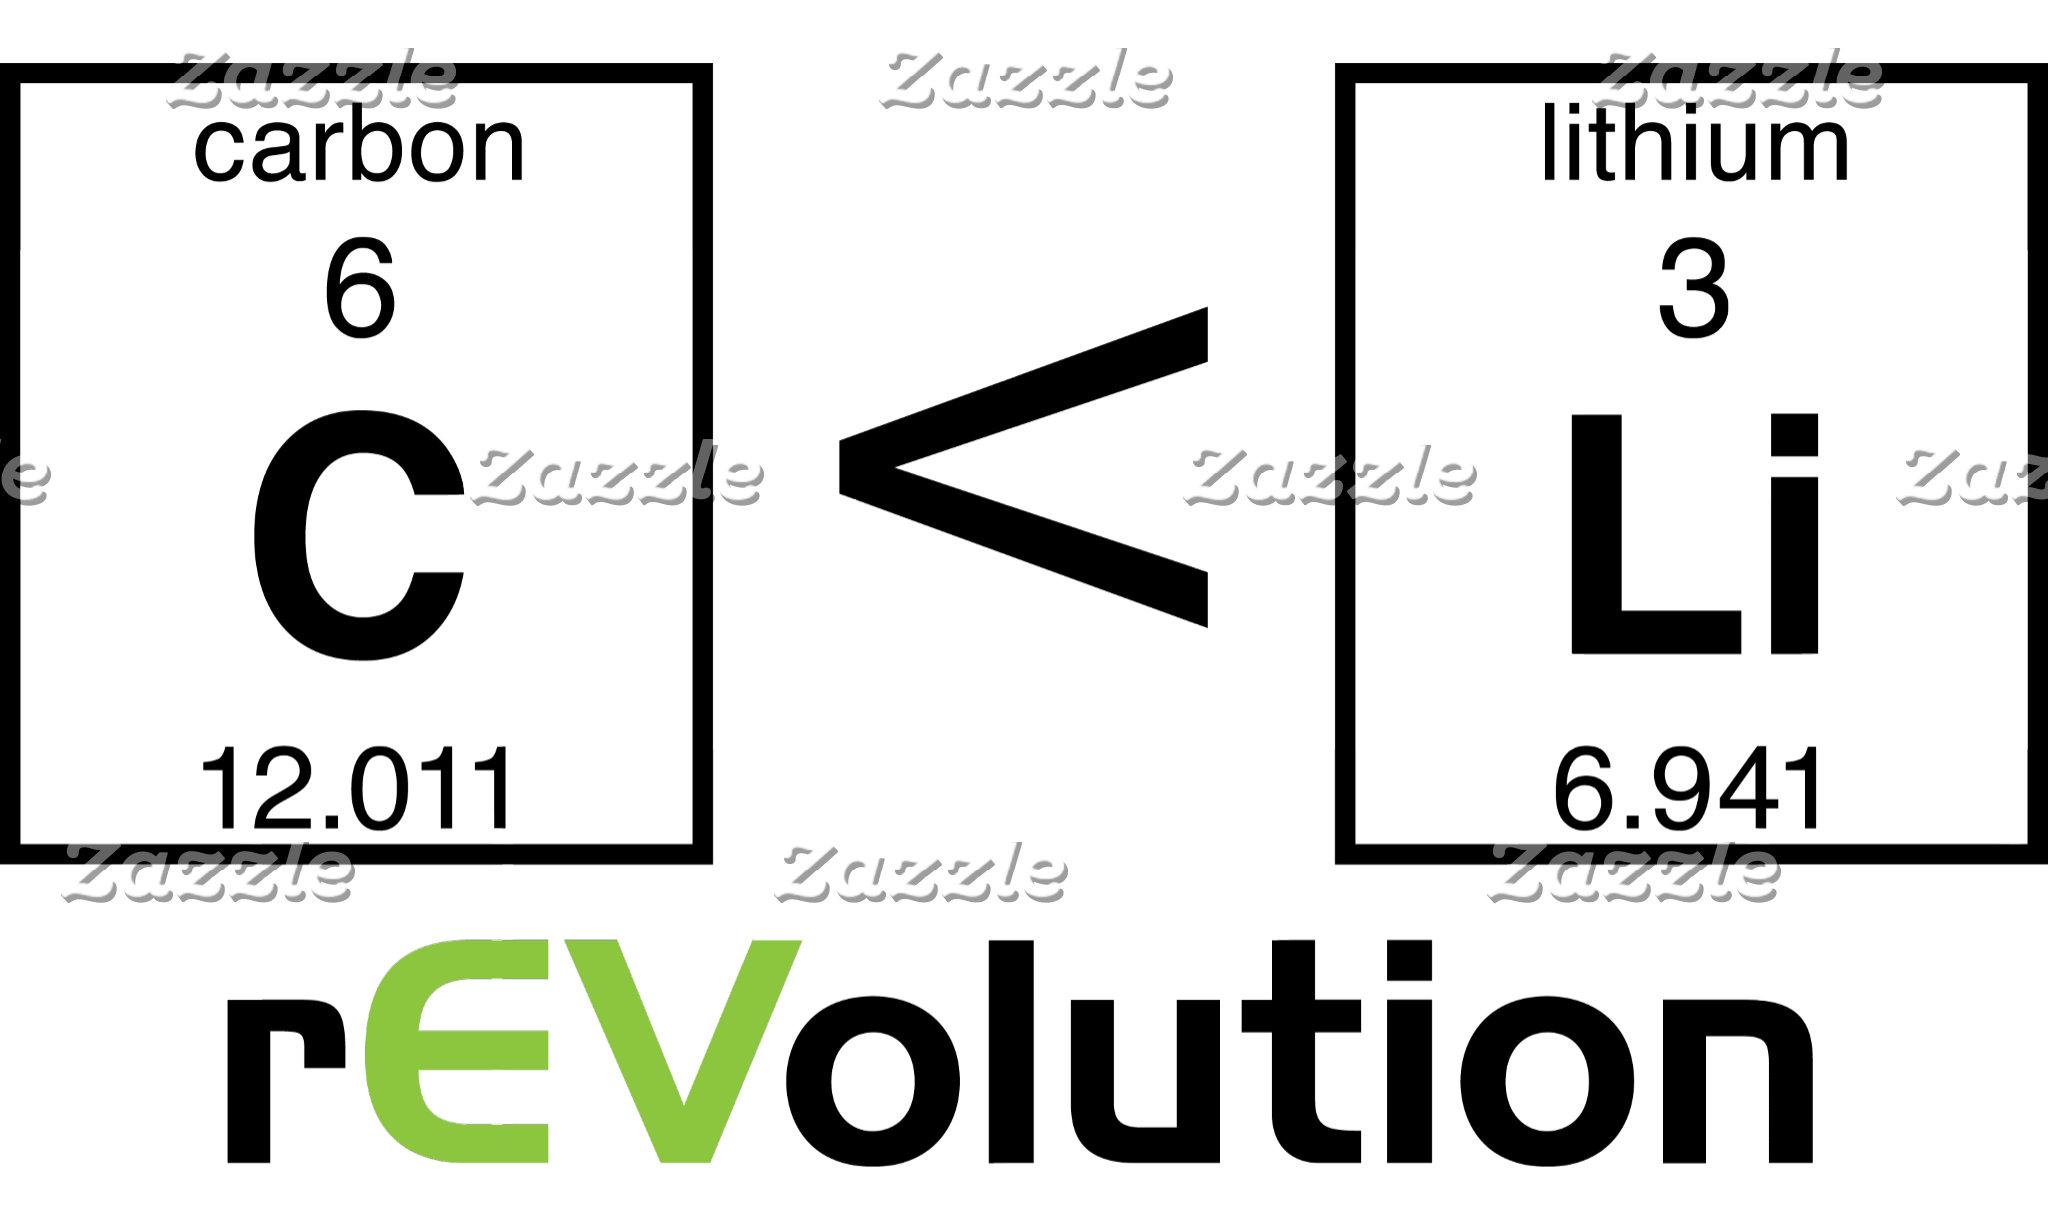 EV - Electric Vehicle